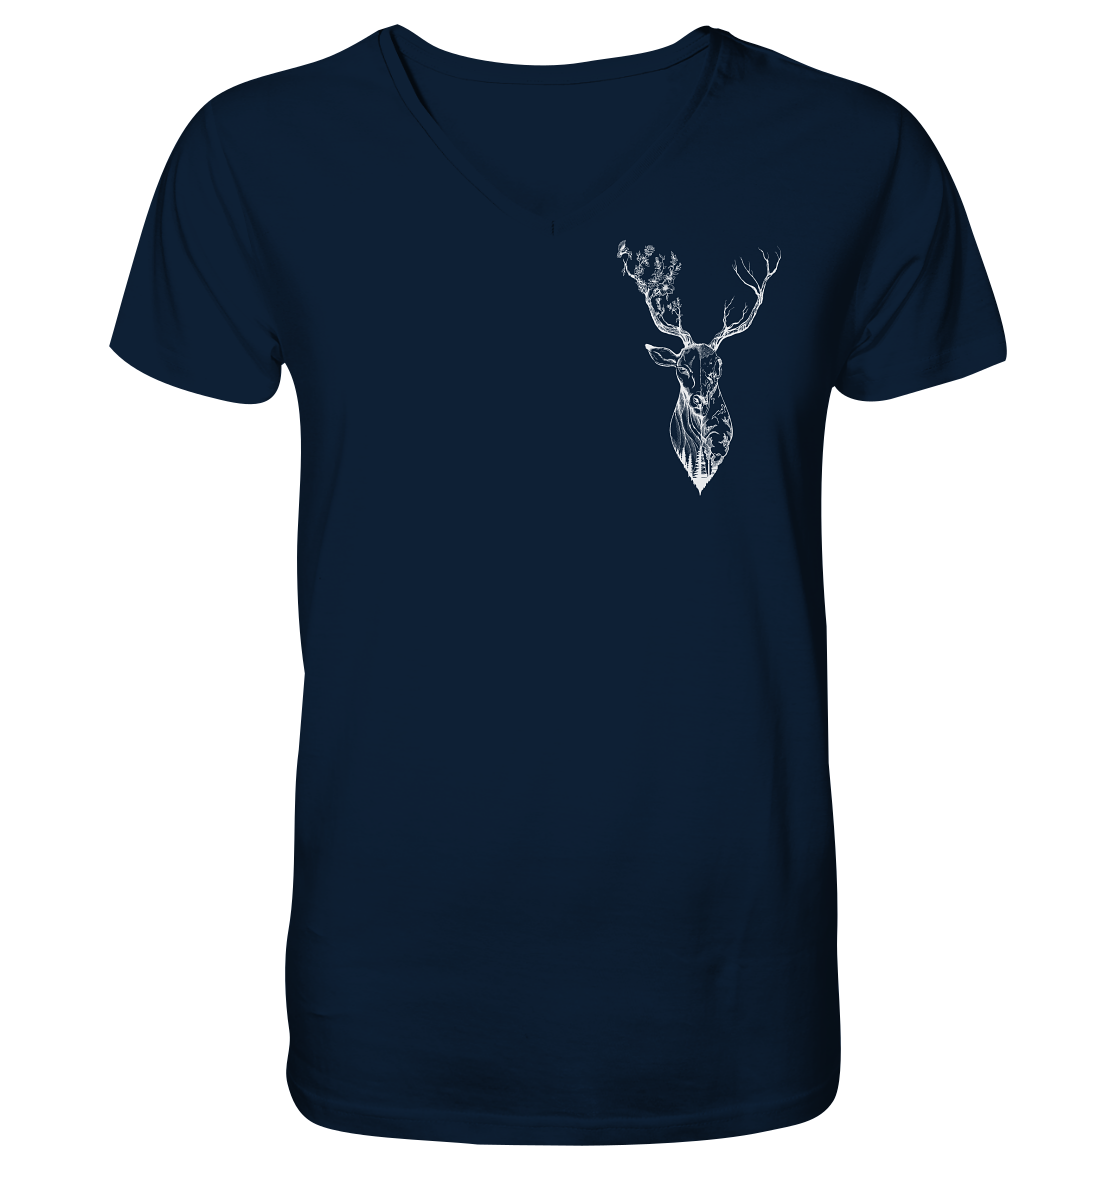 front-mens-organic-v-neck-shirt-0e2035-1116x-5.png